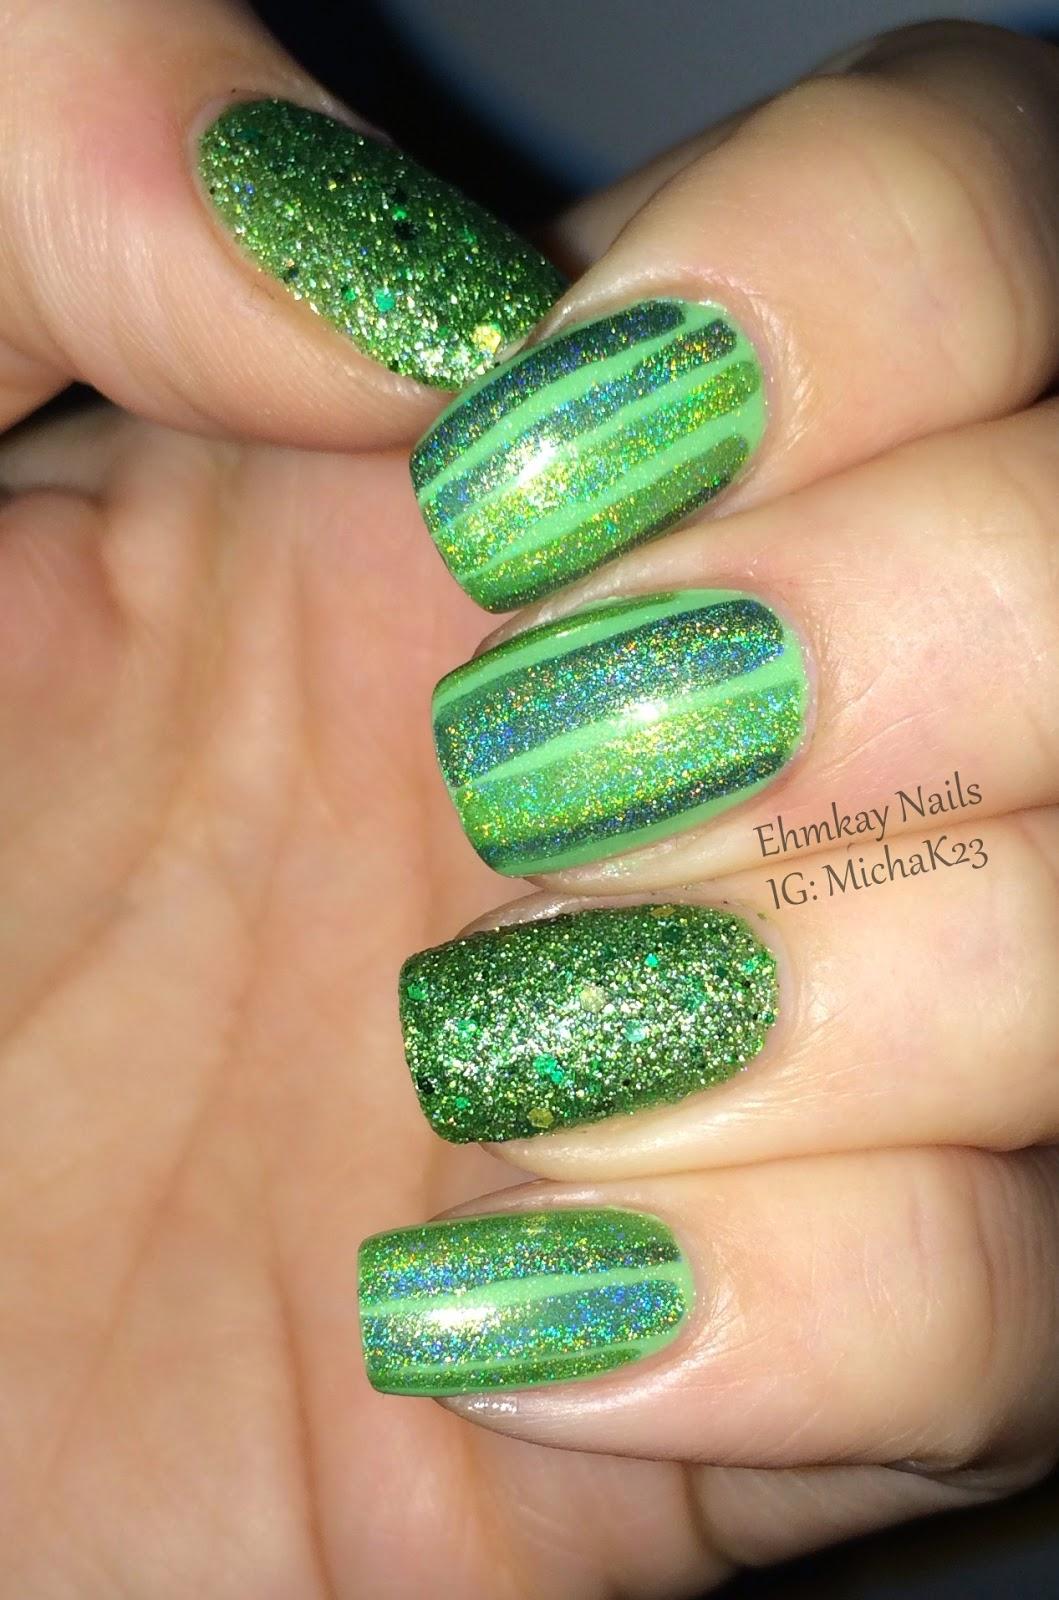 Easy St Patricks Day Nail Designs : Ehmkay nails easy st patrick s day nail art with red dog designs